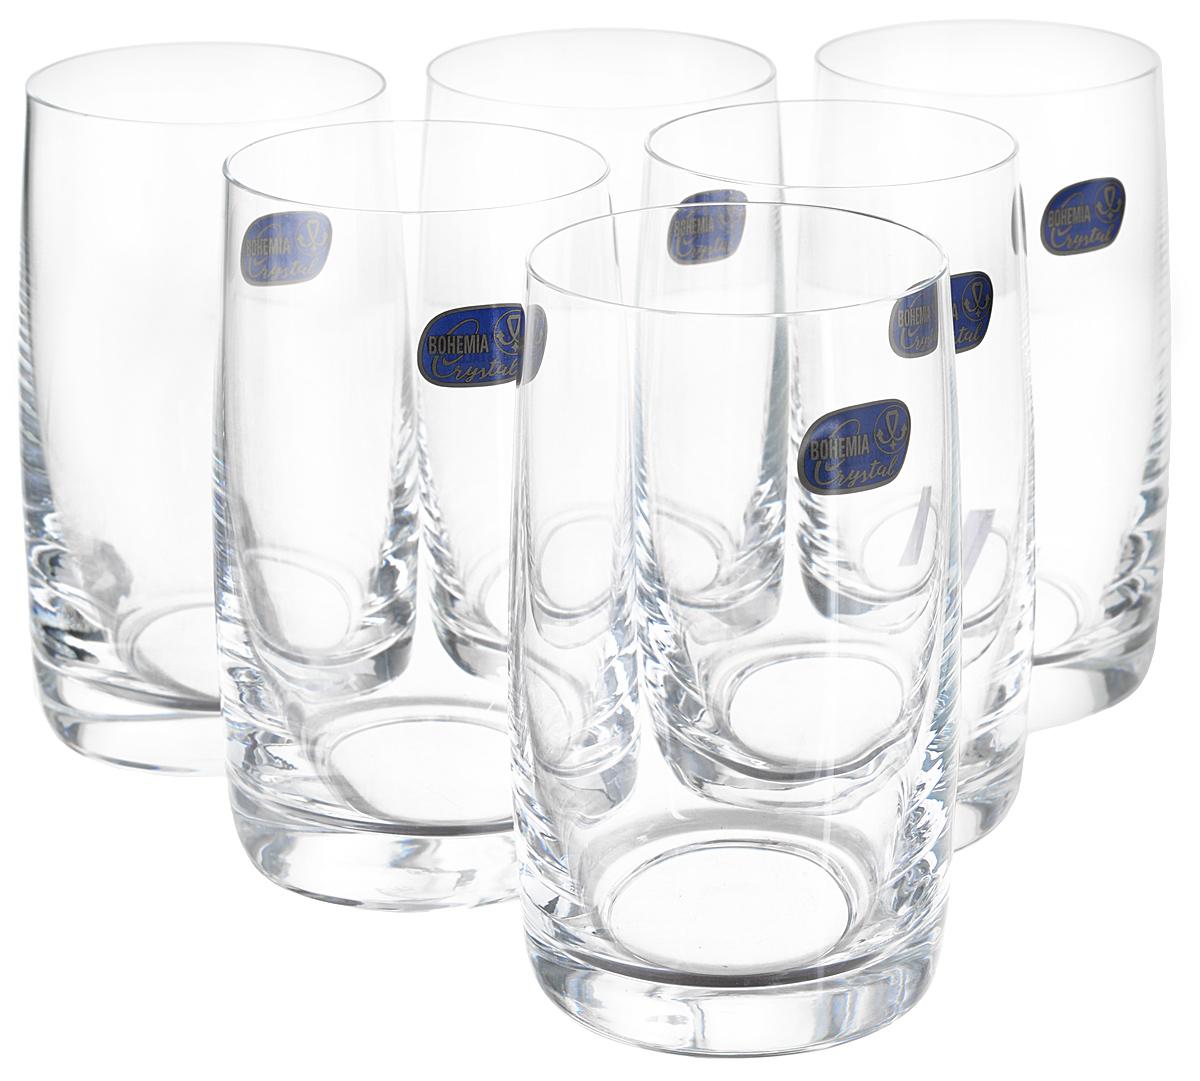 Набор стаканов для воды Bohemia Crystall Идеал, 250 мл, 6 шт бокалы злата bohemia crystall